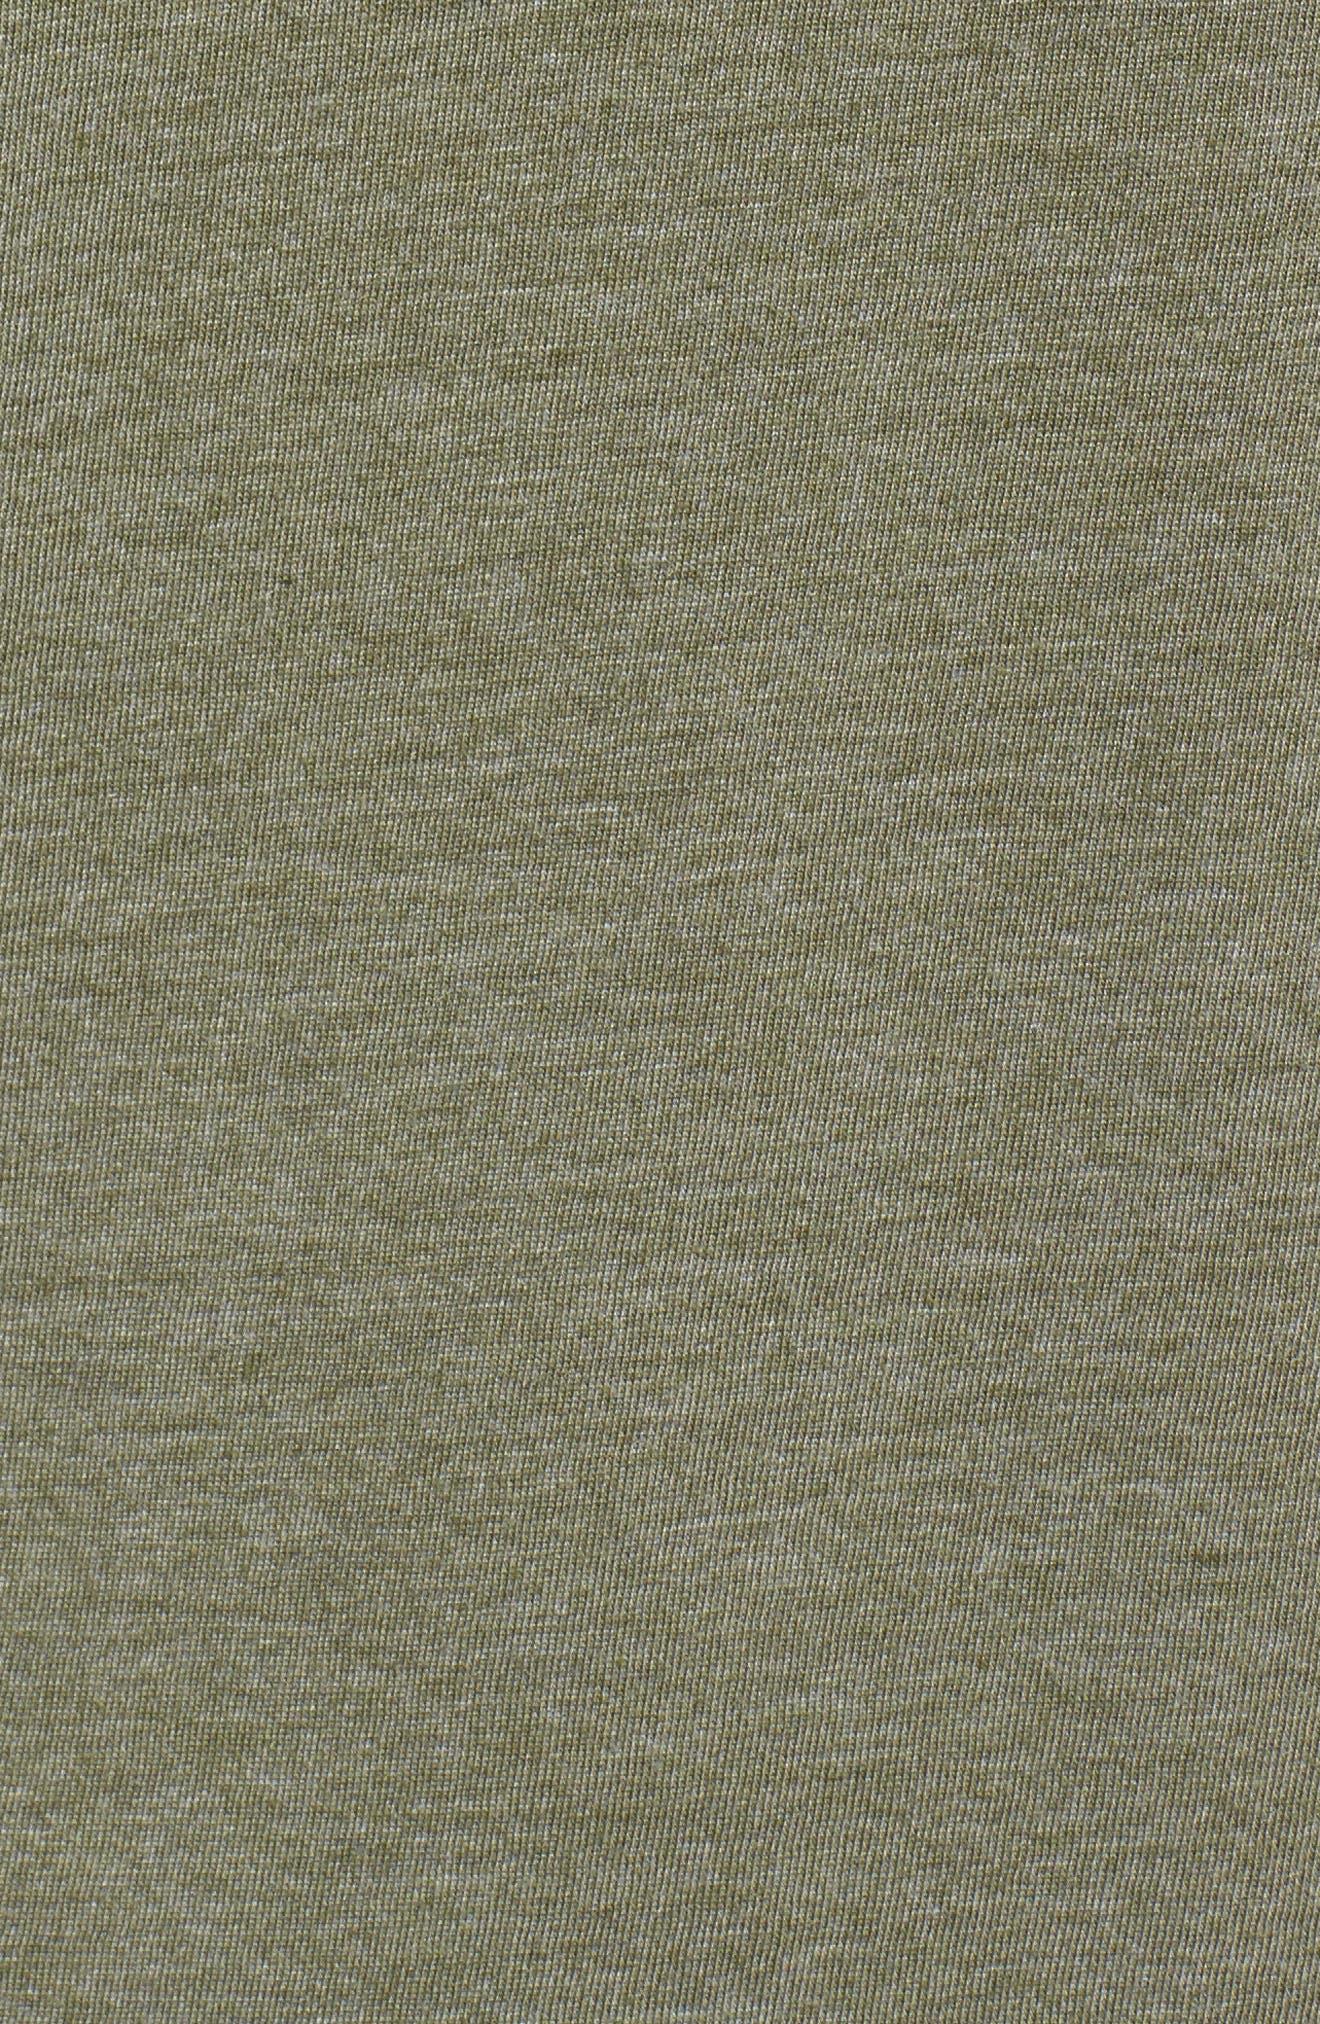 Triblend Pocket Tee,                             Alternate thumbnail 6, color,                             301